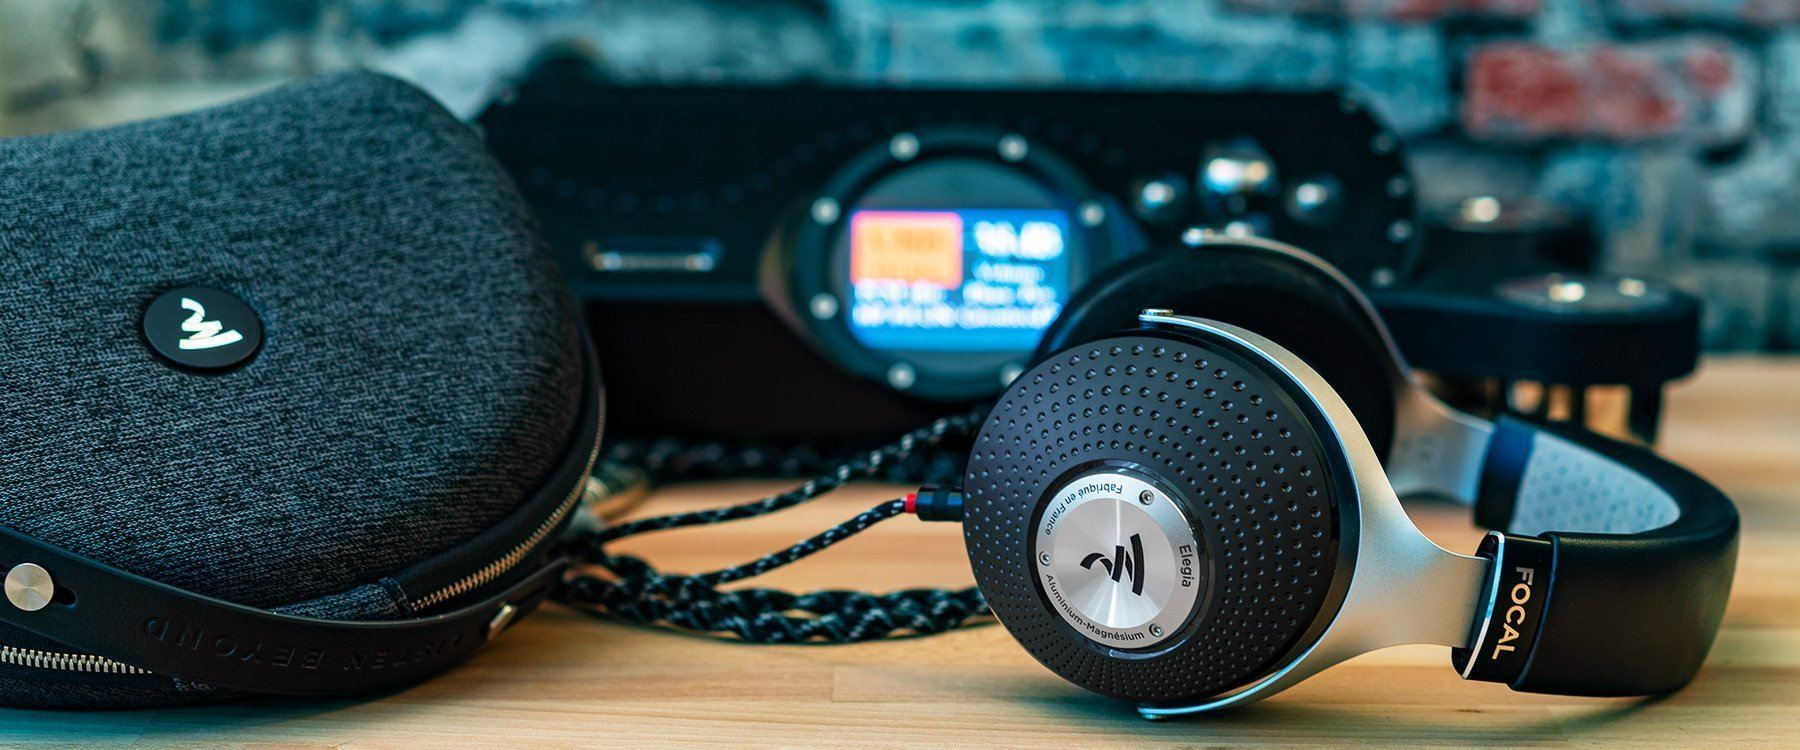 Focal Elegia - Closed-Back Dynamic Headphone - Review